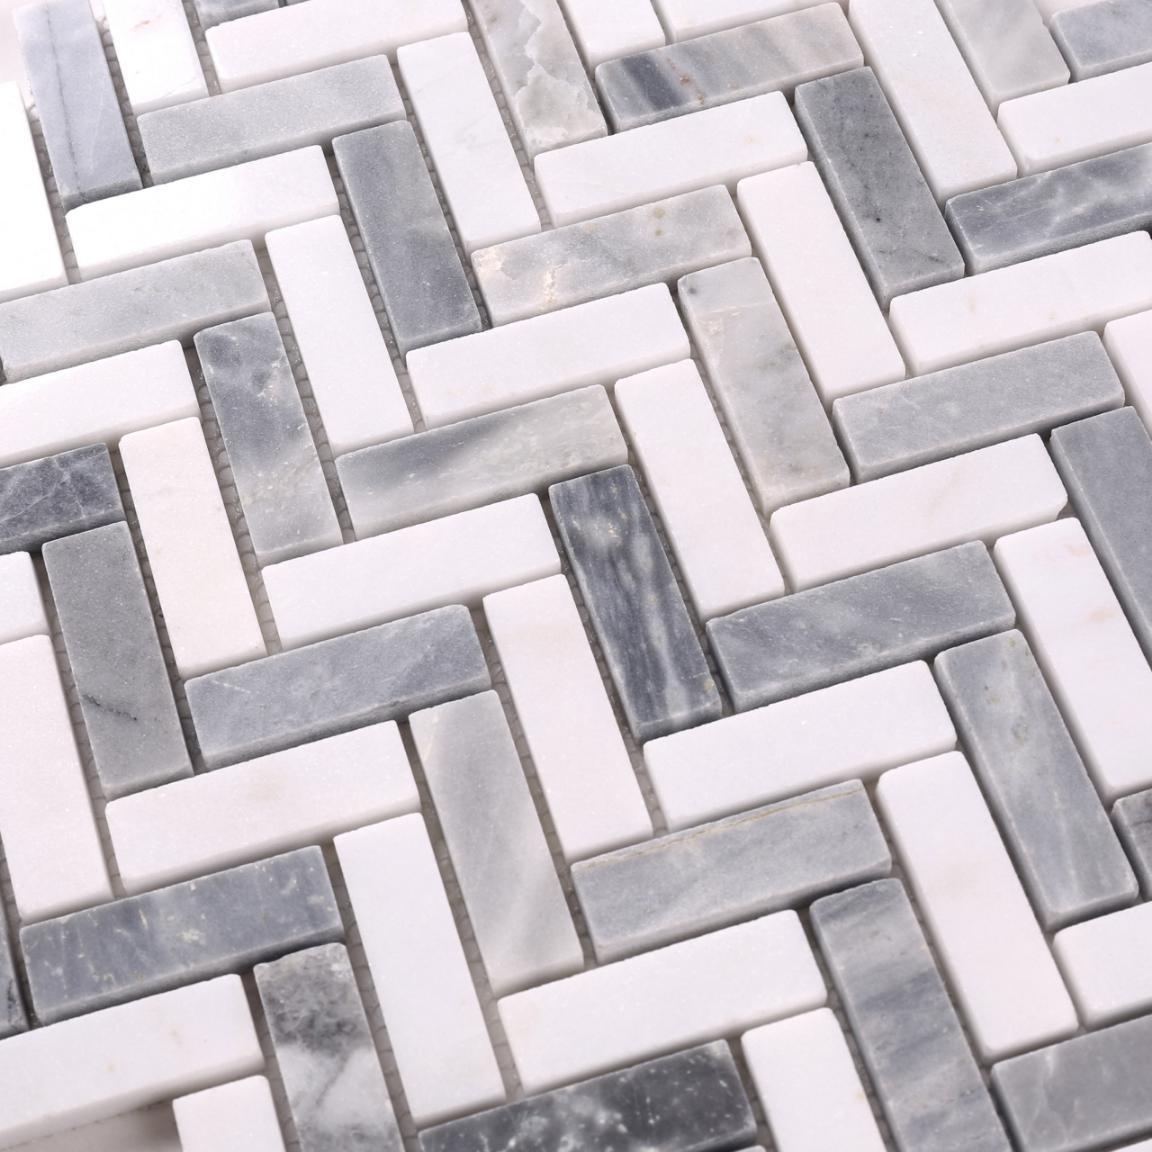 Heng Xing-Stone Mosaic Tile Manufacturer, Carrara Marble Mosaic Tile | Heng Xing-1